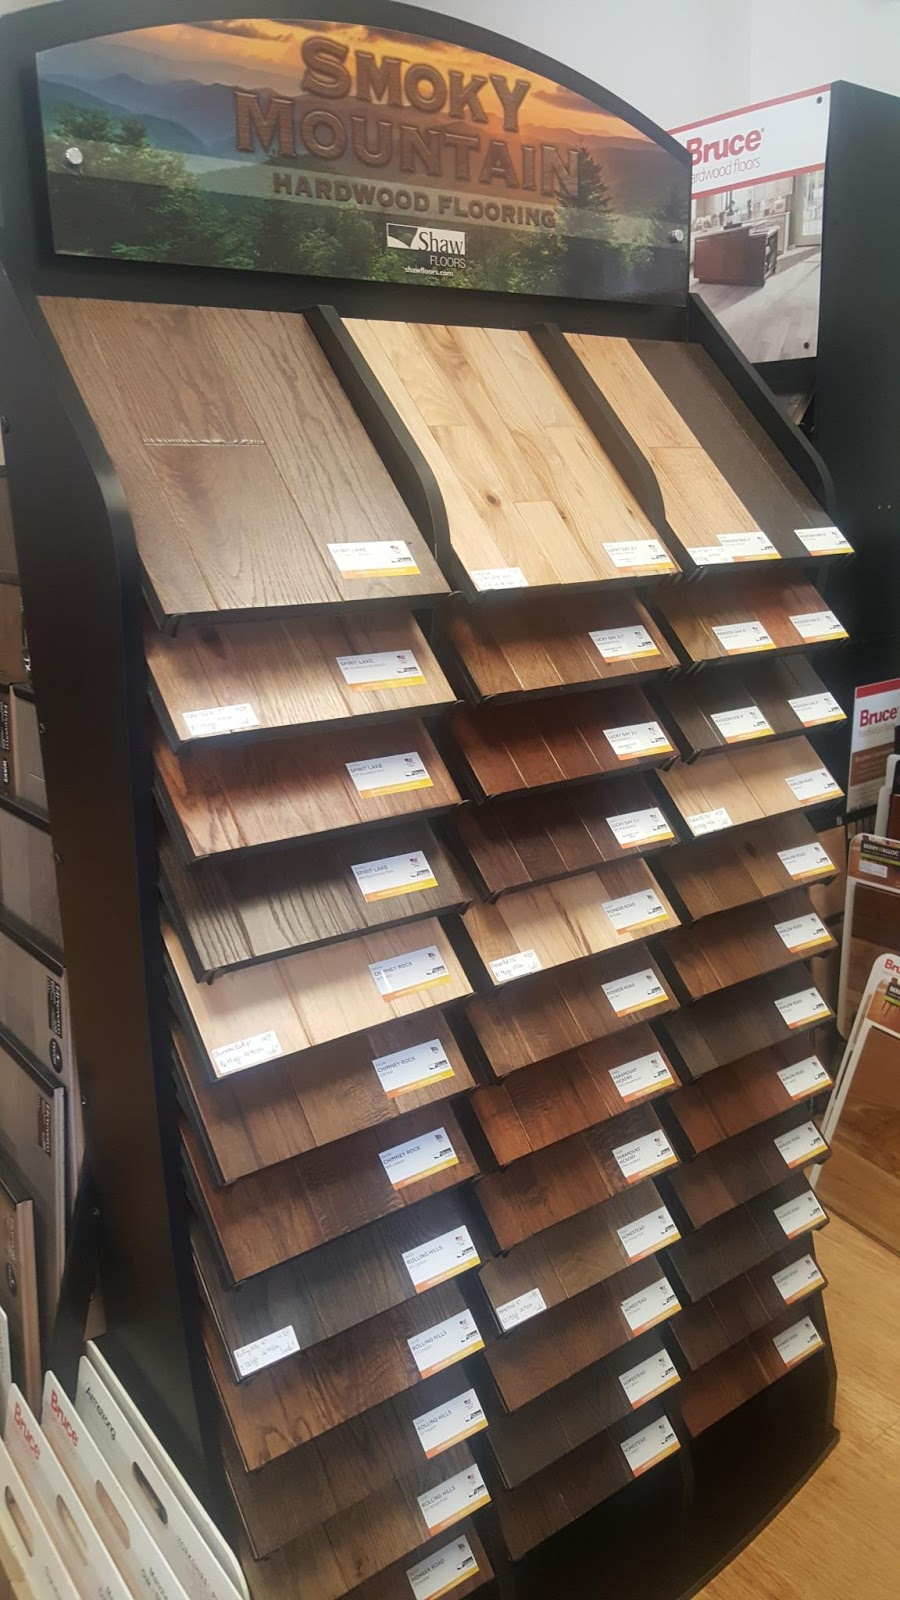 Shaw Hardwood Flooring: Golden Opportunity, Bellingham, Madison Oak Floors  In New Jersey NJ